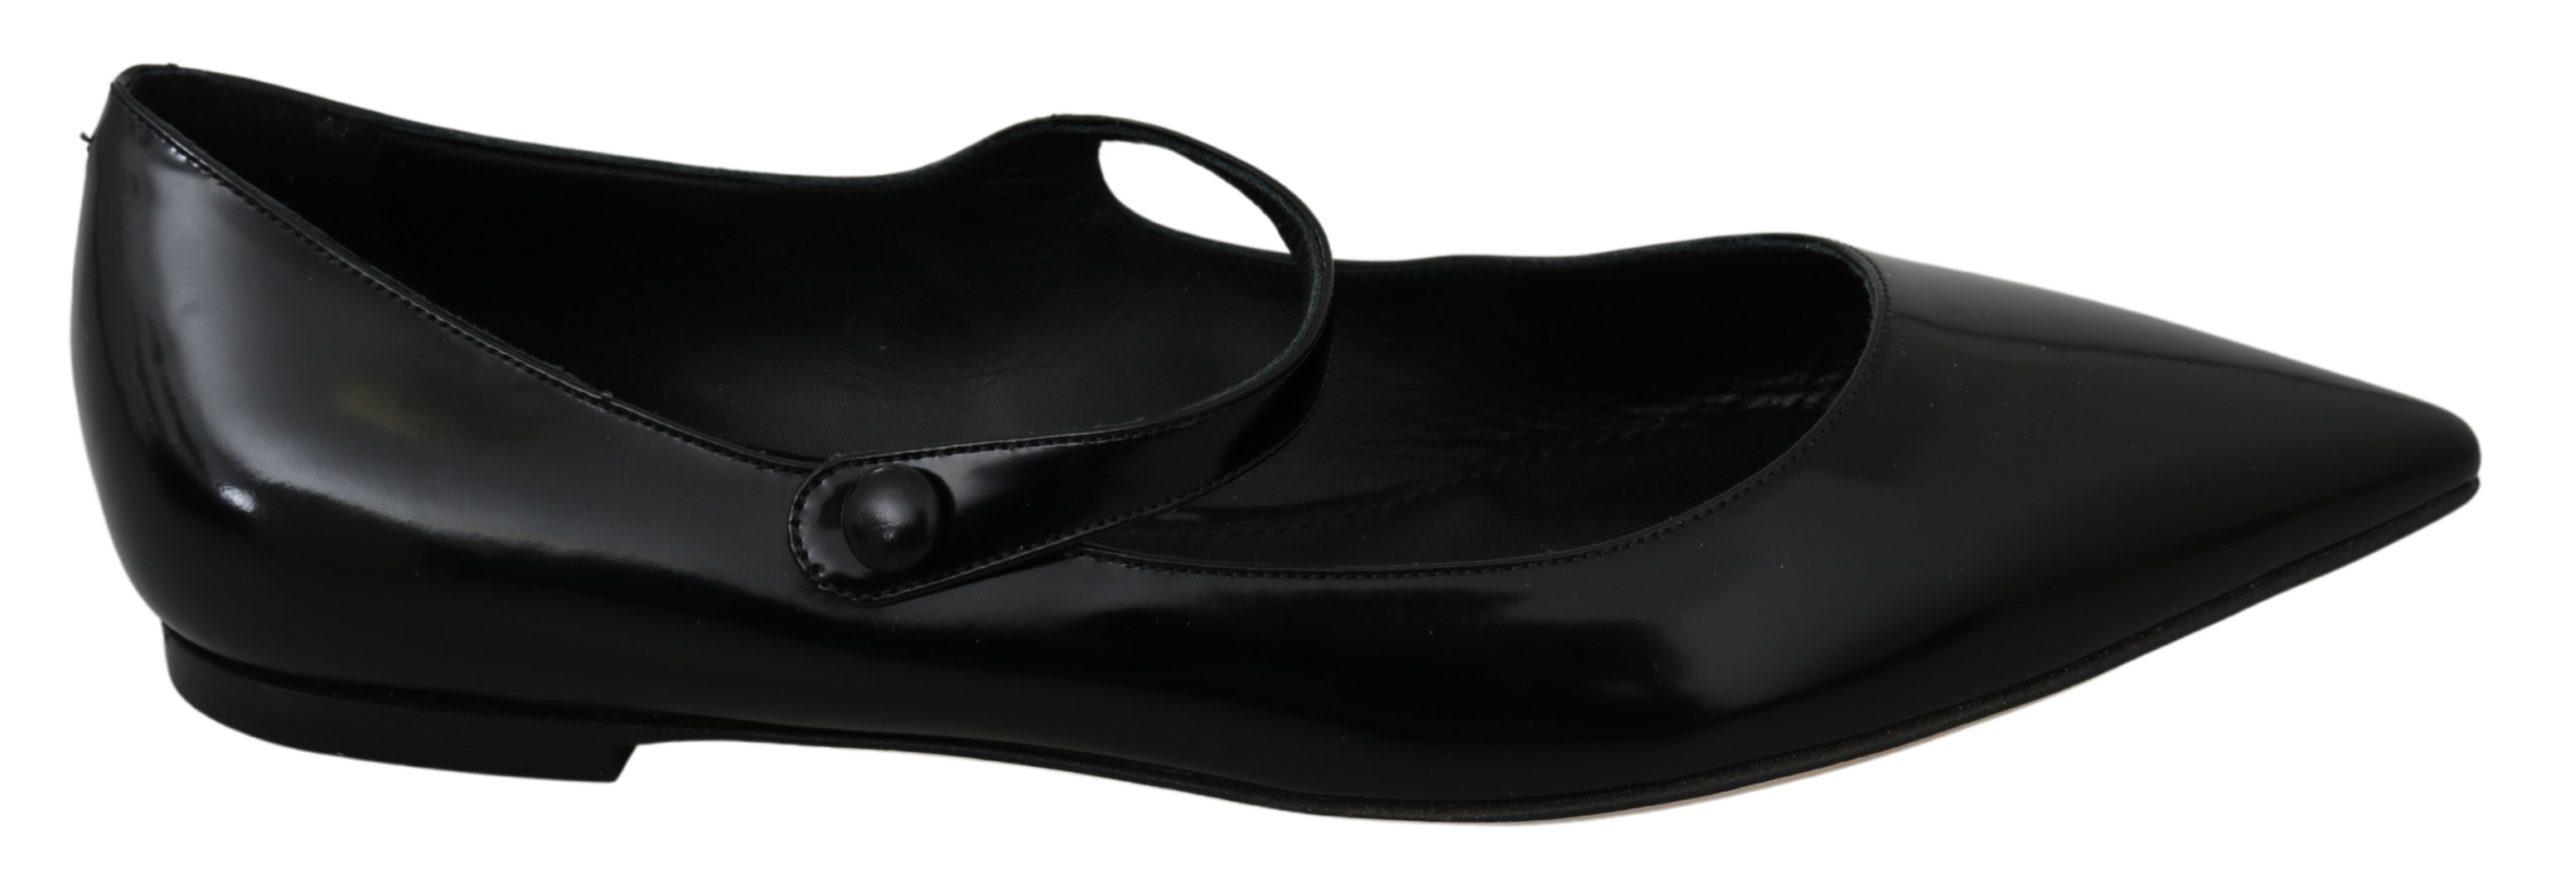 Dolce & Gabbana Women's Leather Ballerina Mary Jane Flats Black LA6946 - EU39/US8.5